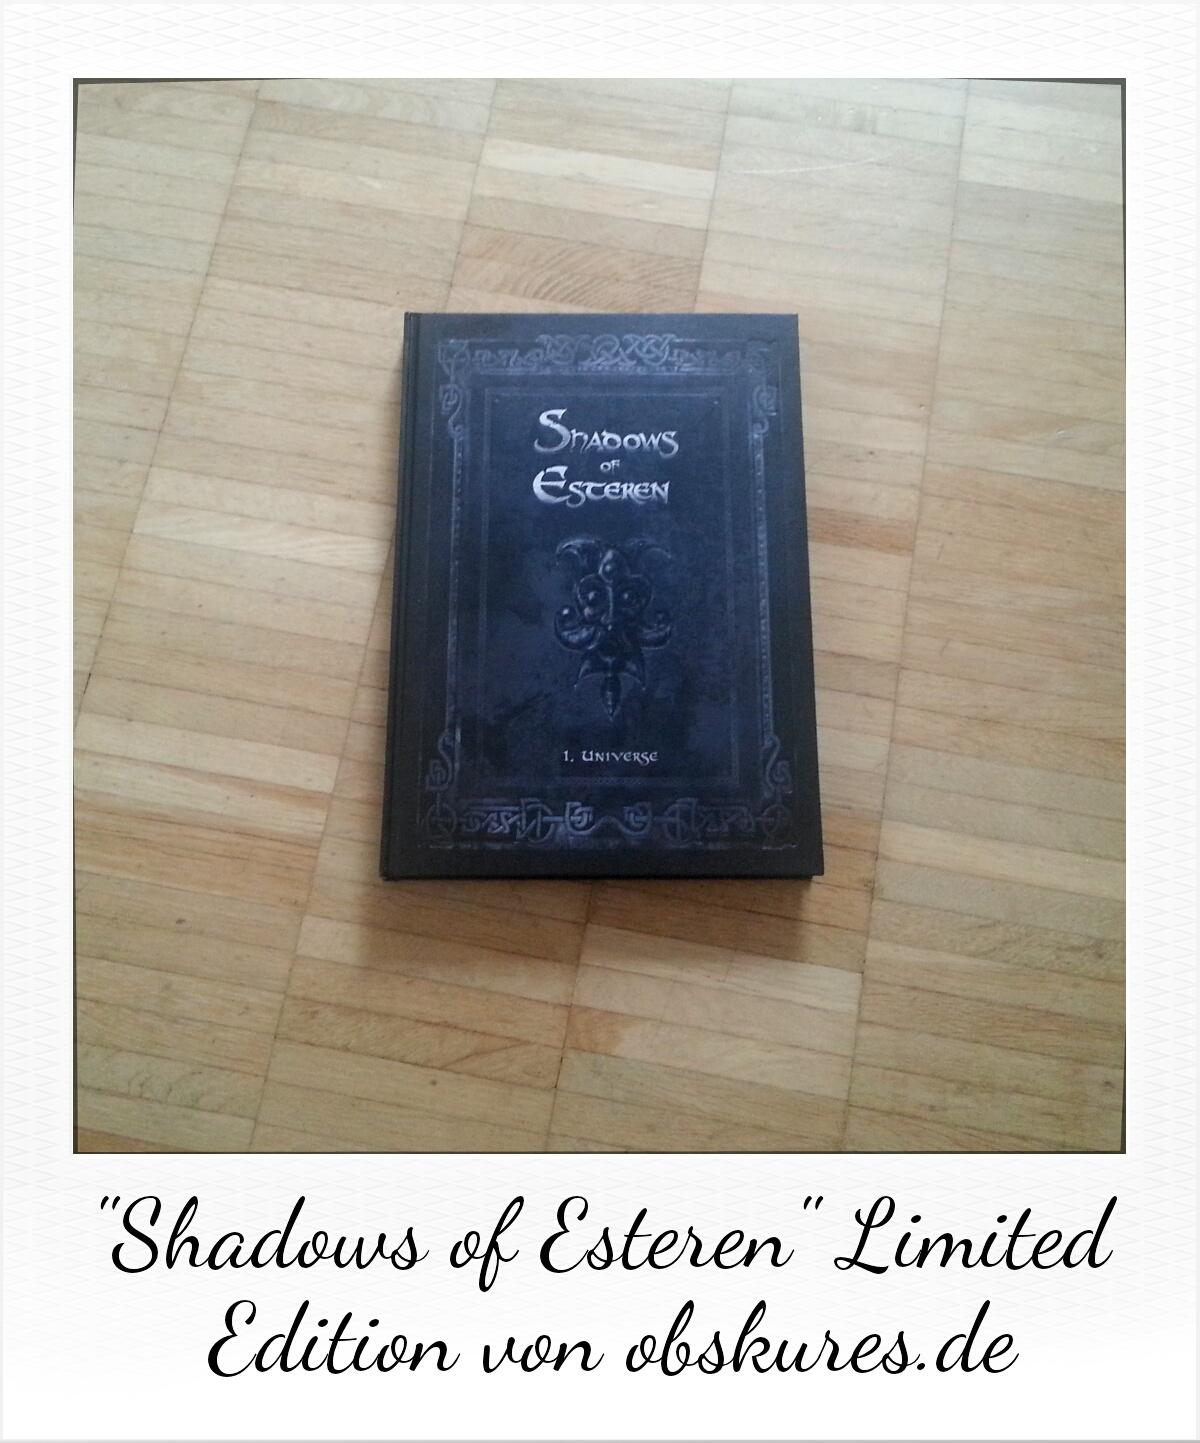 """Shadows of Esteren"" Limited Edition von obskures.de"